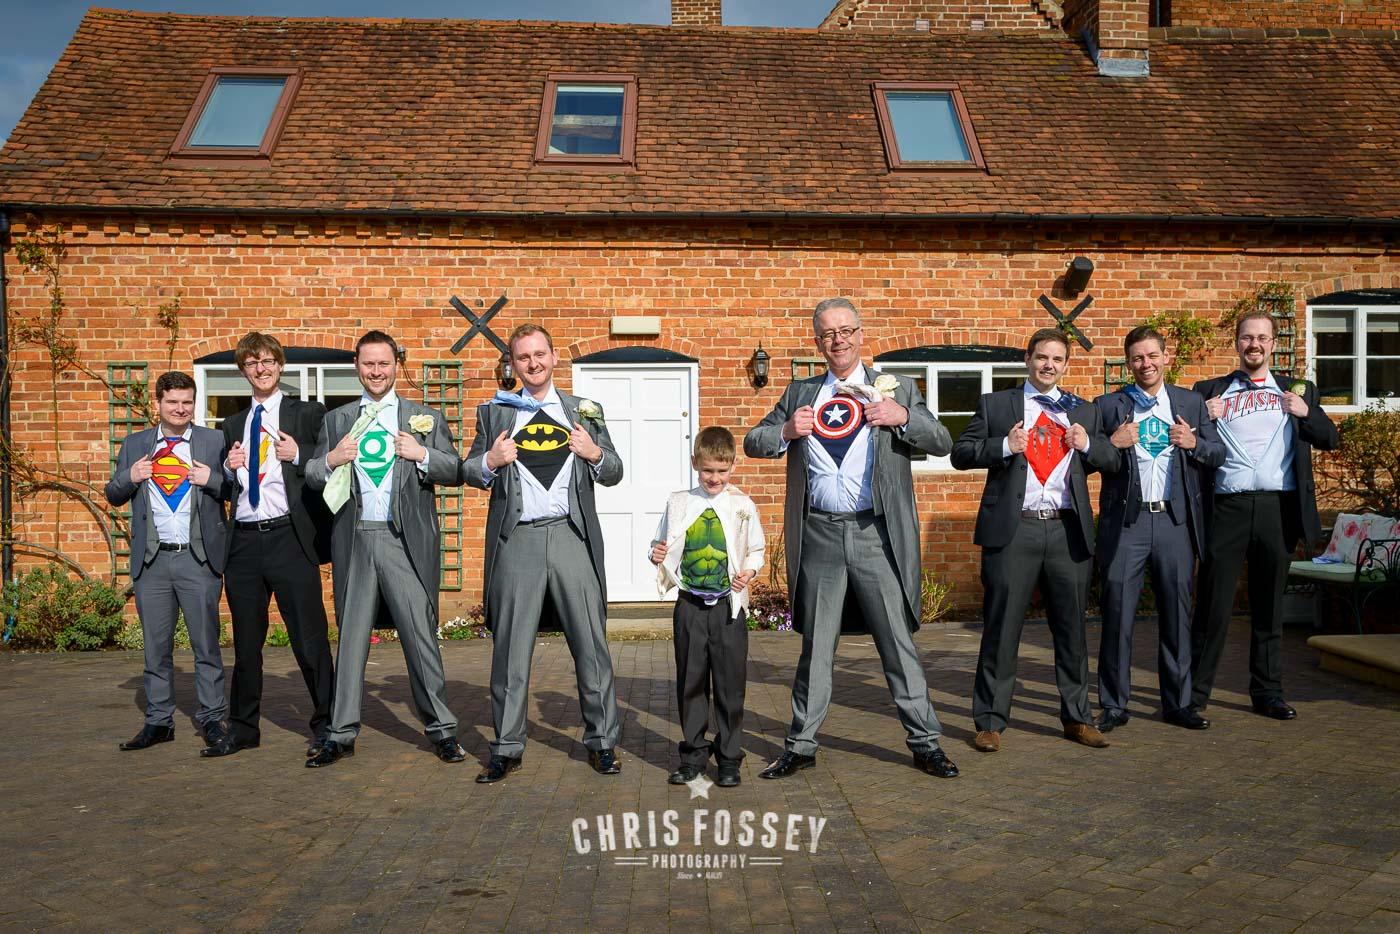 Wethele Manor Warwickshire Chris Fossey Wedding Photography Warwickshire